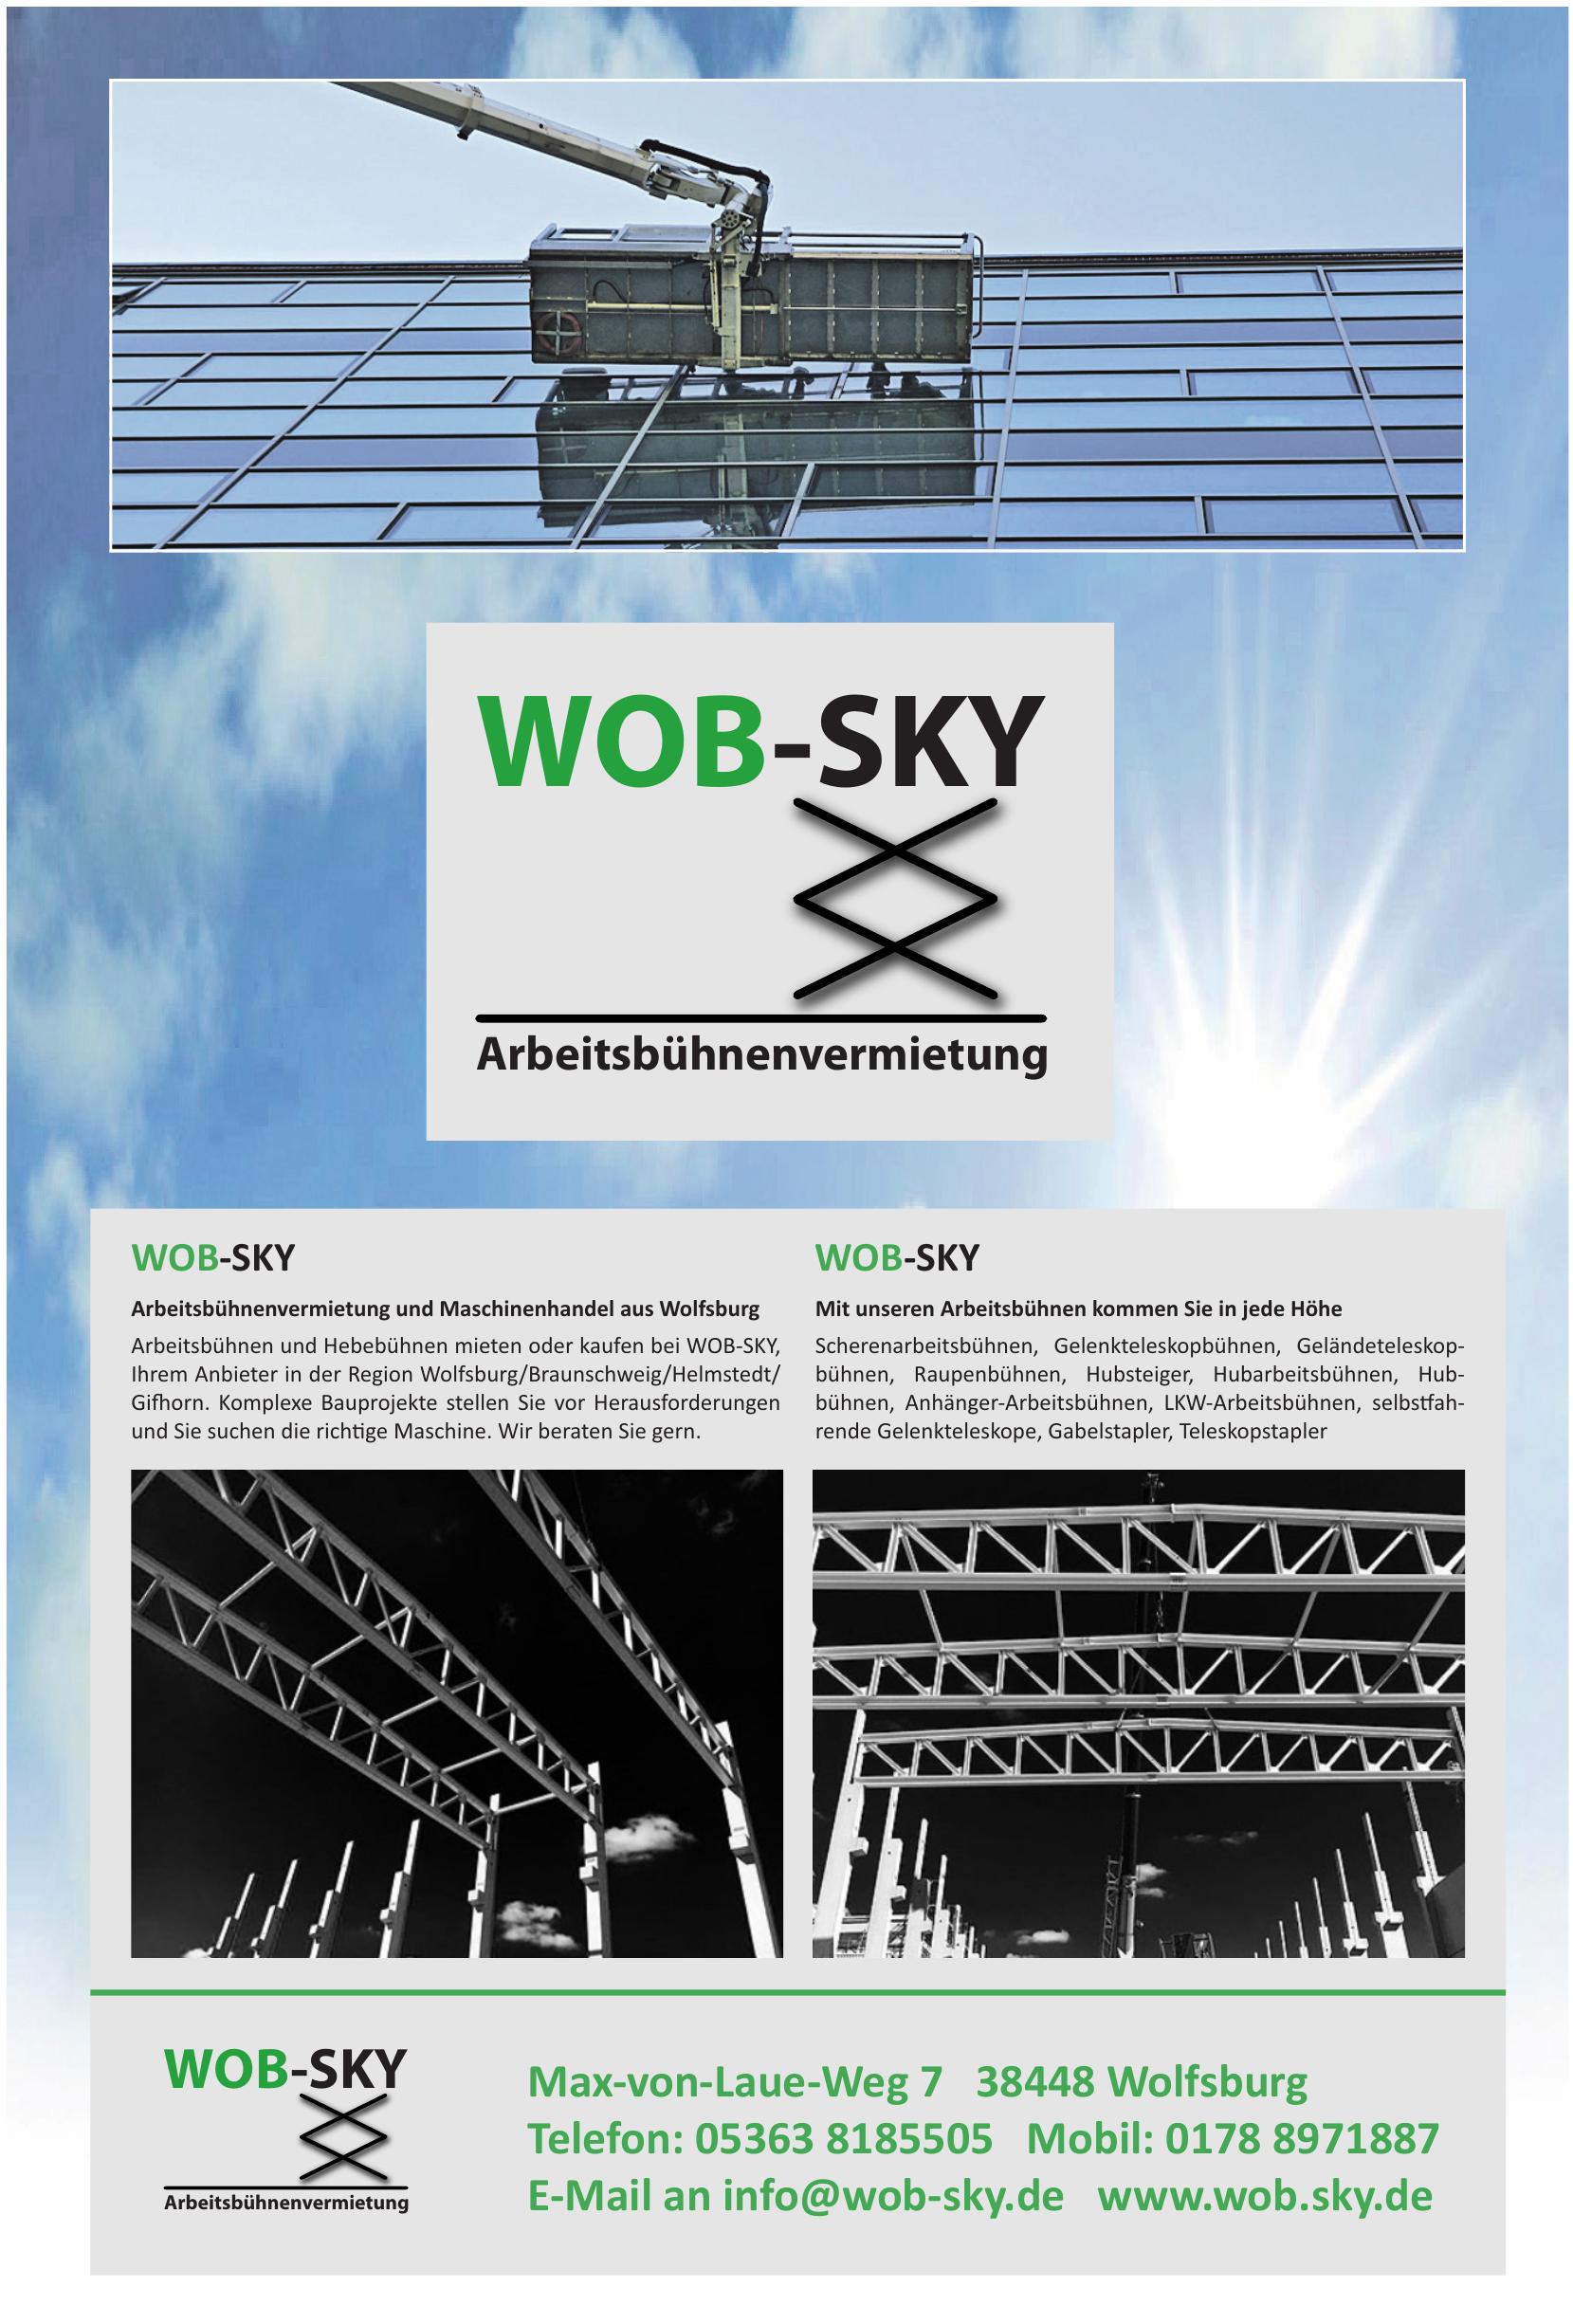 Wob-Sky GmbH